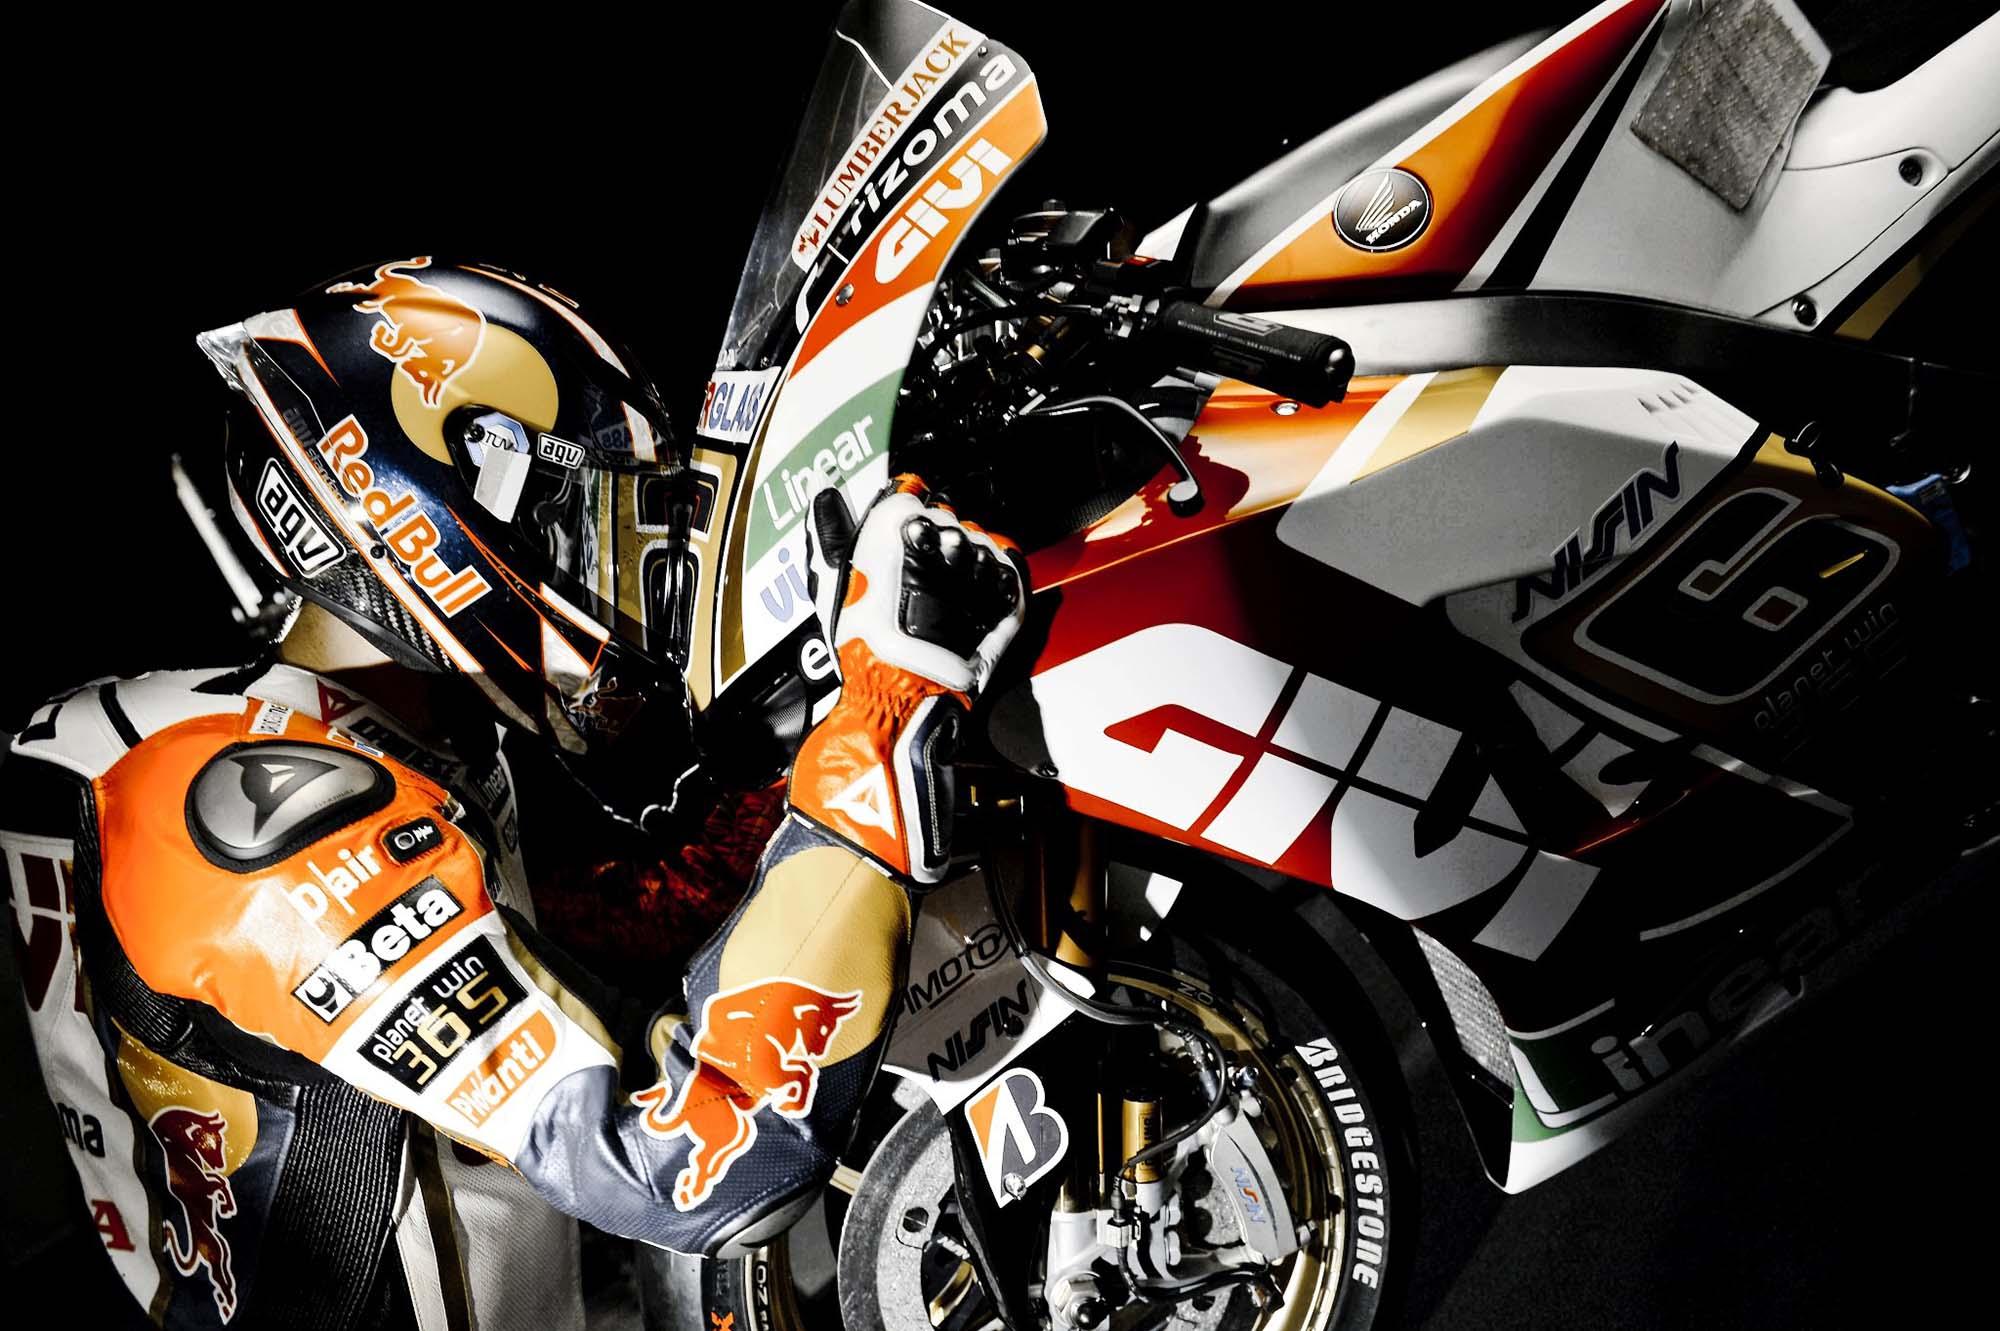 Lcr Honda Motogp Team Lcr-honda-stefan-bradl-motogp